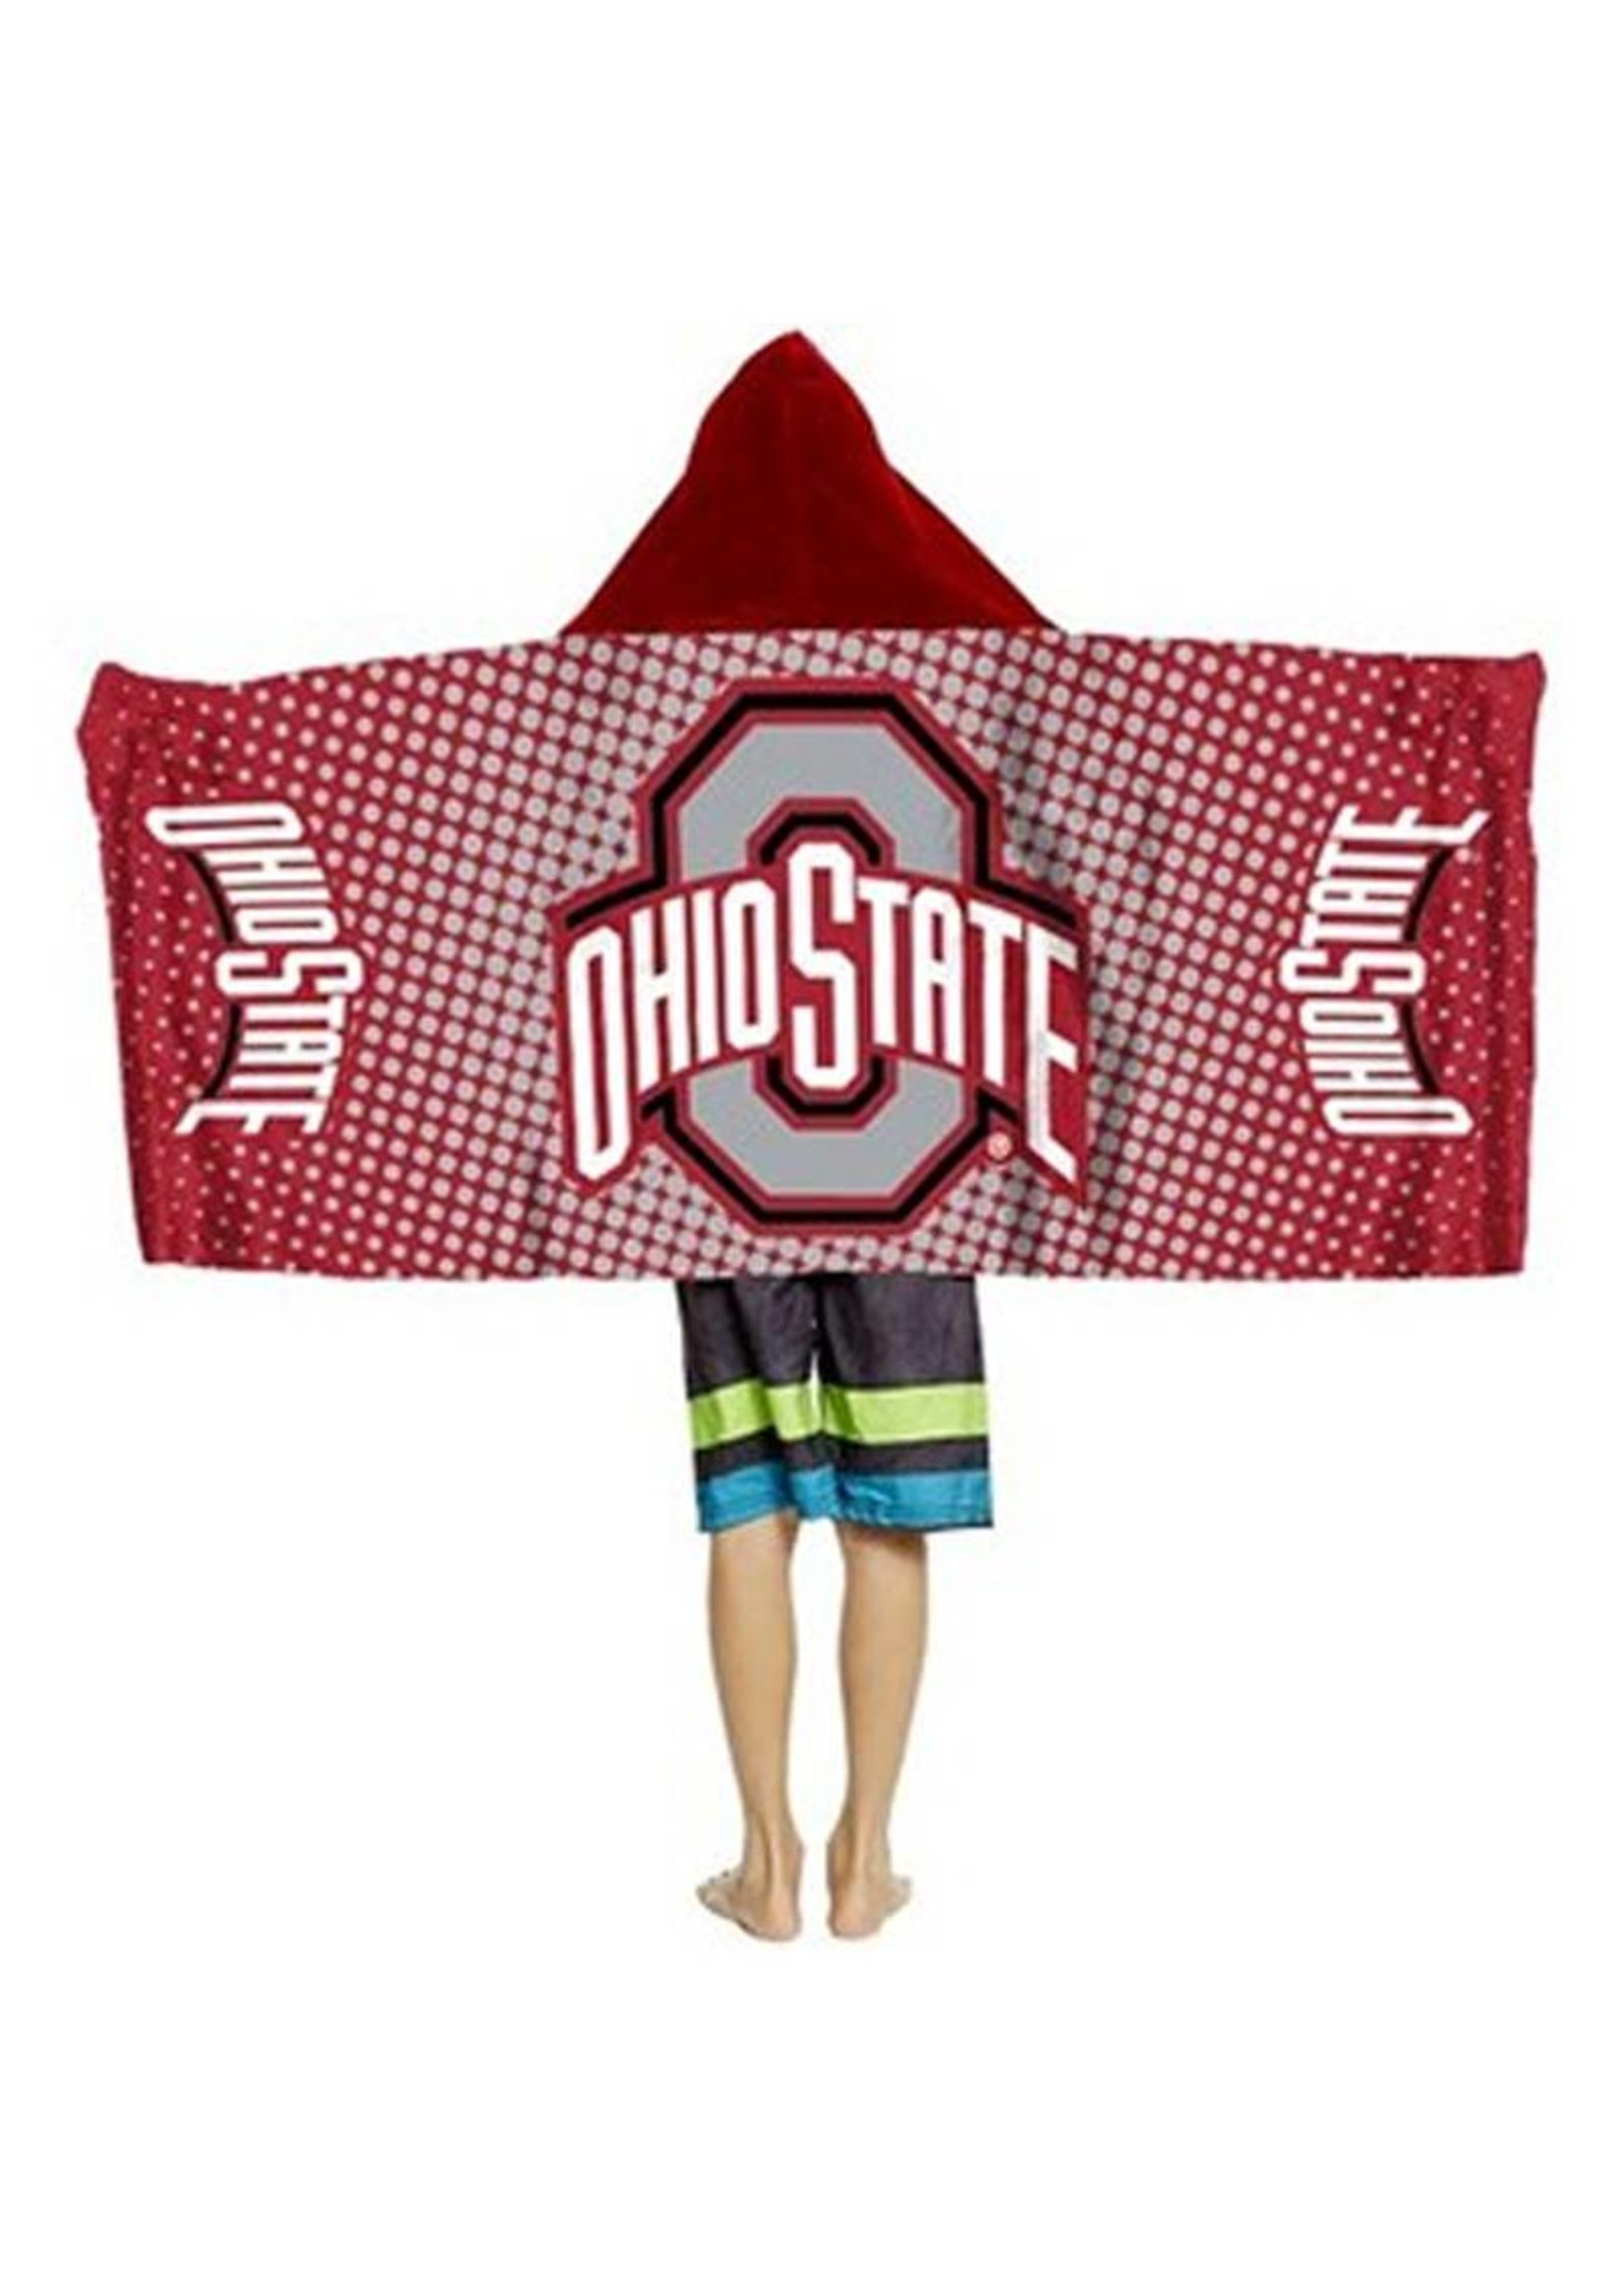 Ohio State University Youth Hooded Towel Wrap